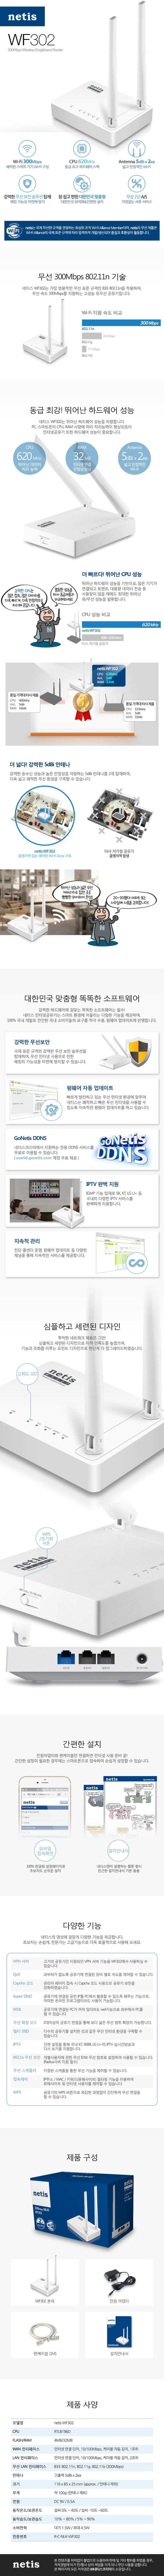 netis WF302 유무선공유기